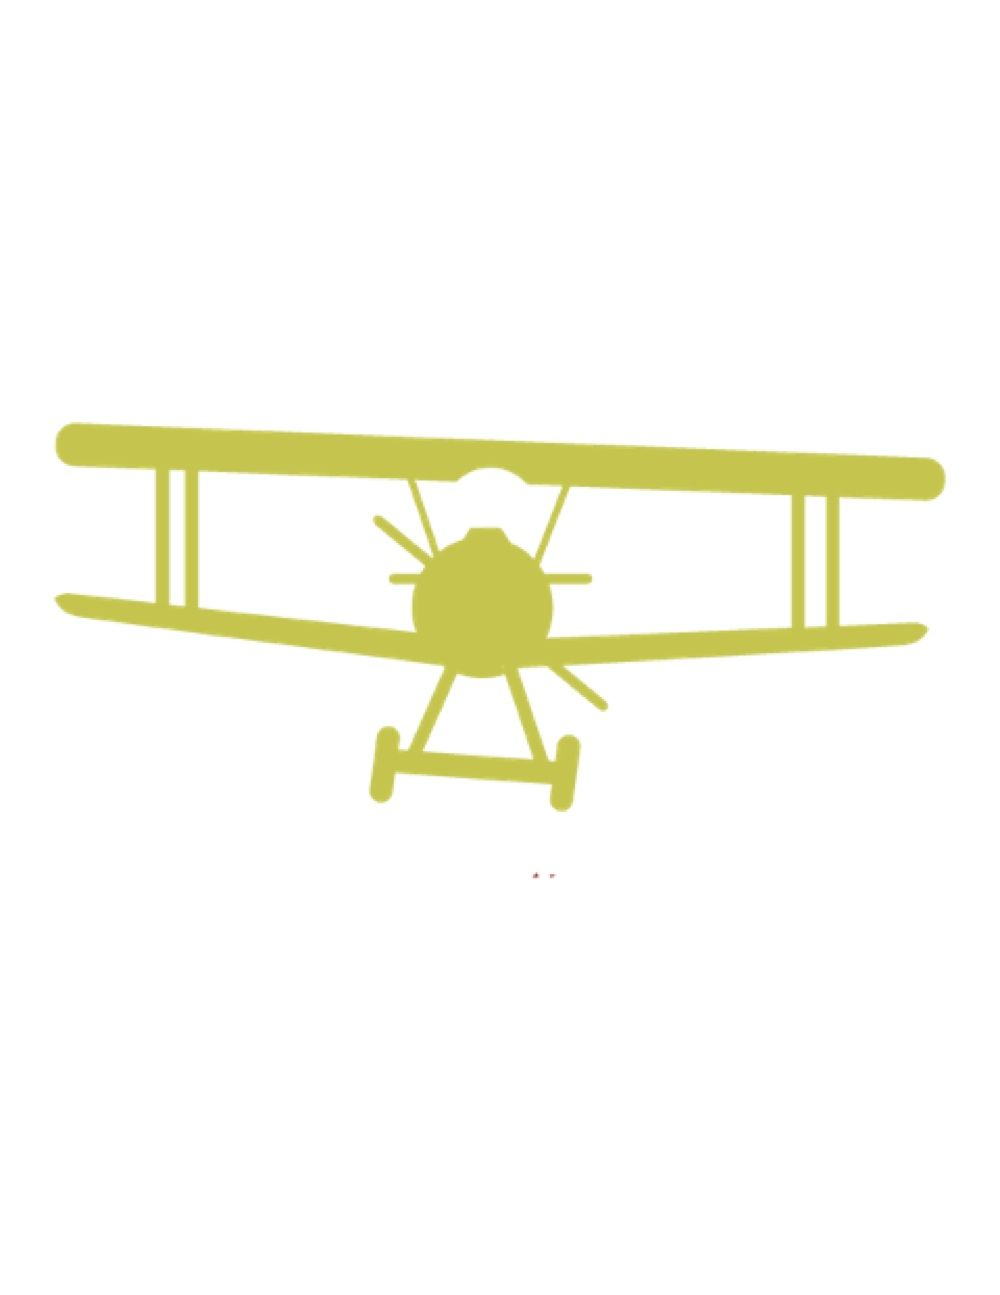 Free Air Themed Printables | Vintage airplanes, Airplanes ...